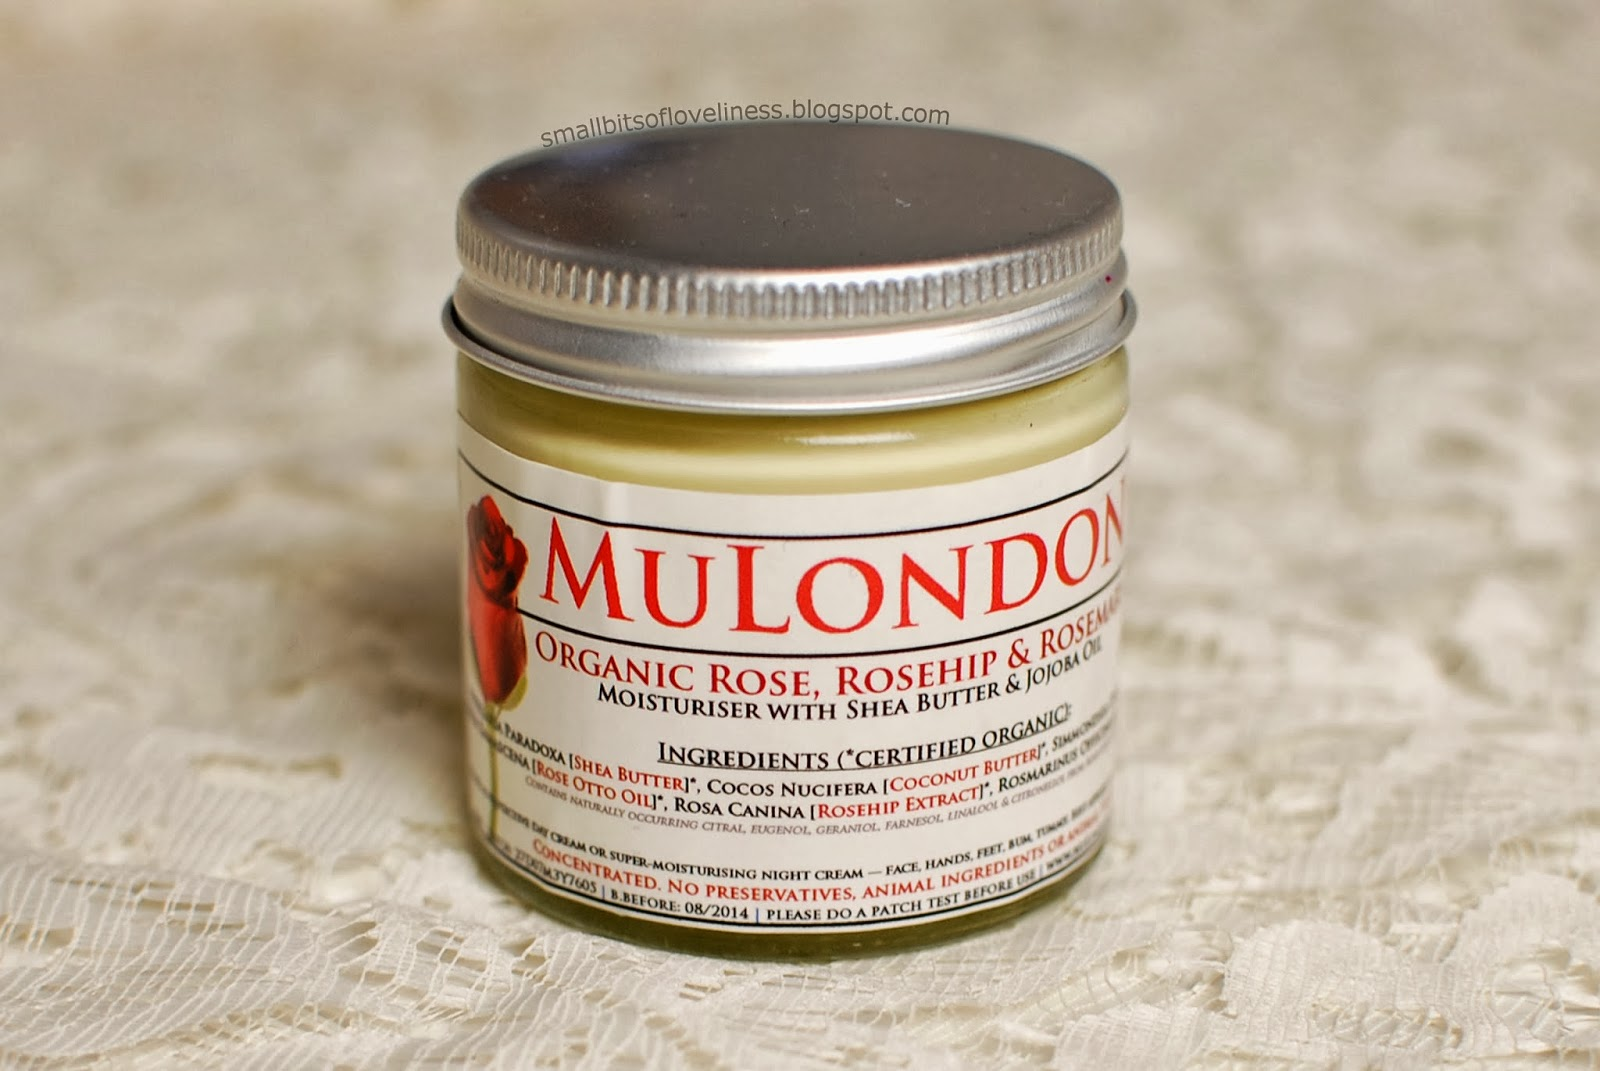 MuLondon Organic Rose, Rosehip & Rosemary Moisturiser